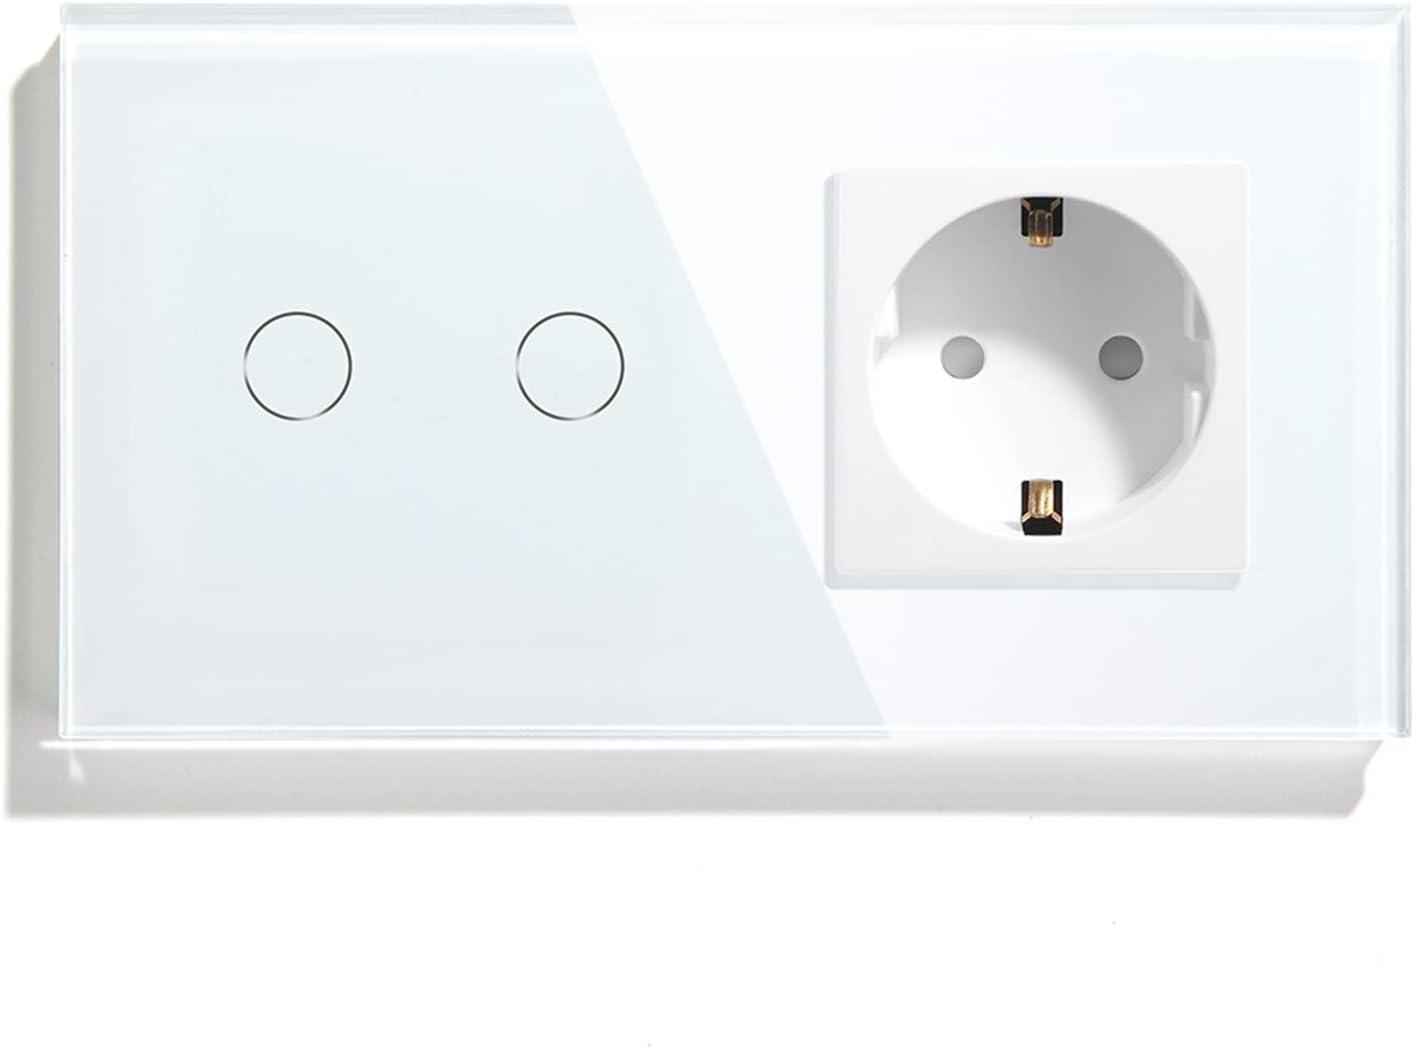 BSEED interruptor luz pared con enchufe,1 Gang 1 Way interruptor tactil pared Normal 16A a 250V Enchufe de pared,Panel de cristal Schuko Enchufe ...